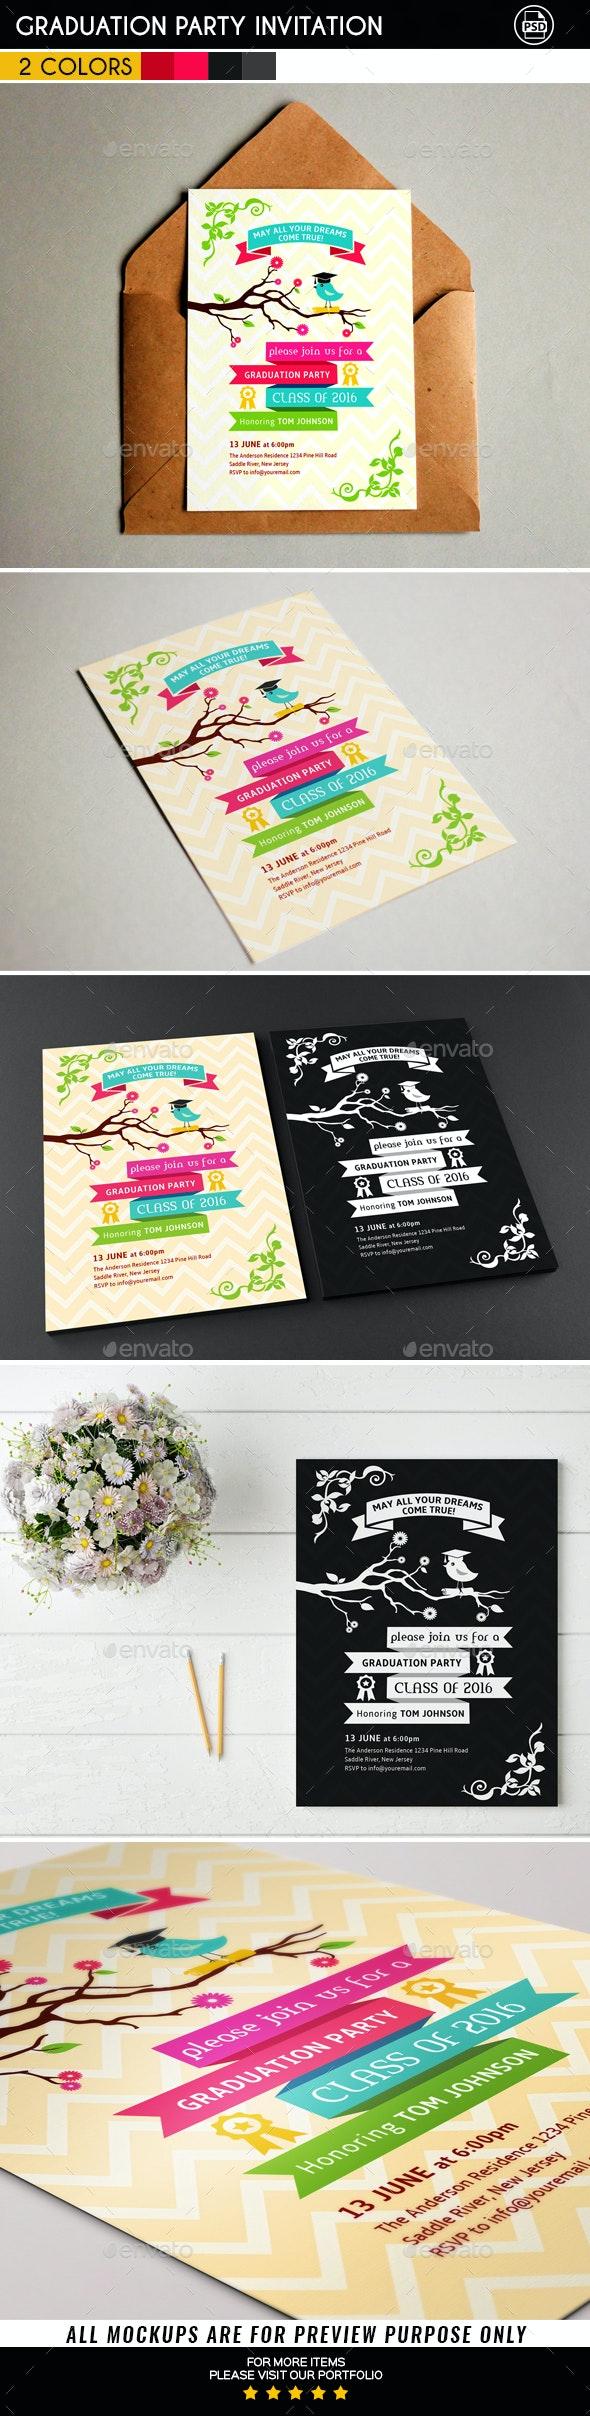 Graduation Party Invitation Card - Invitations Cards & Invites